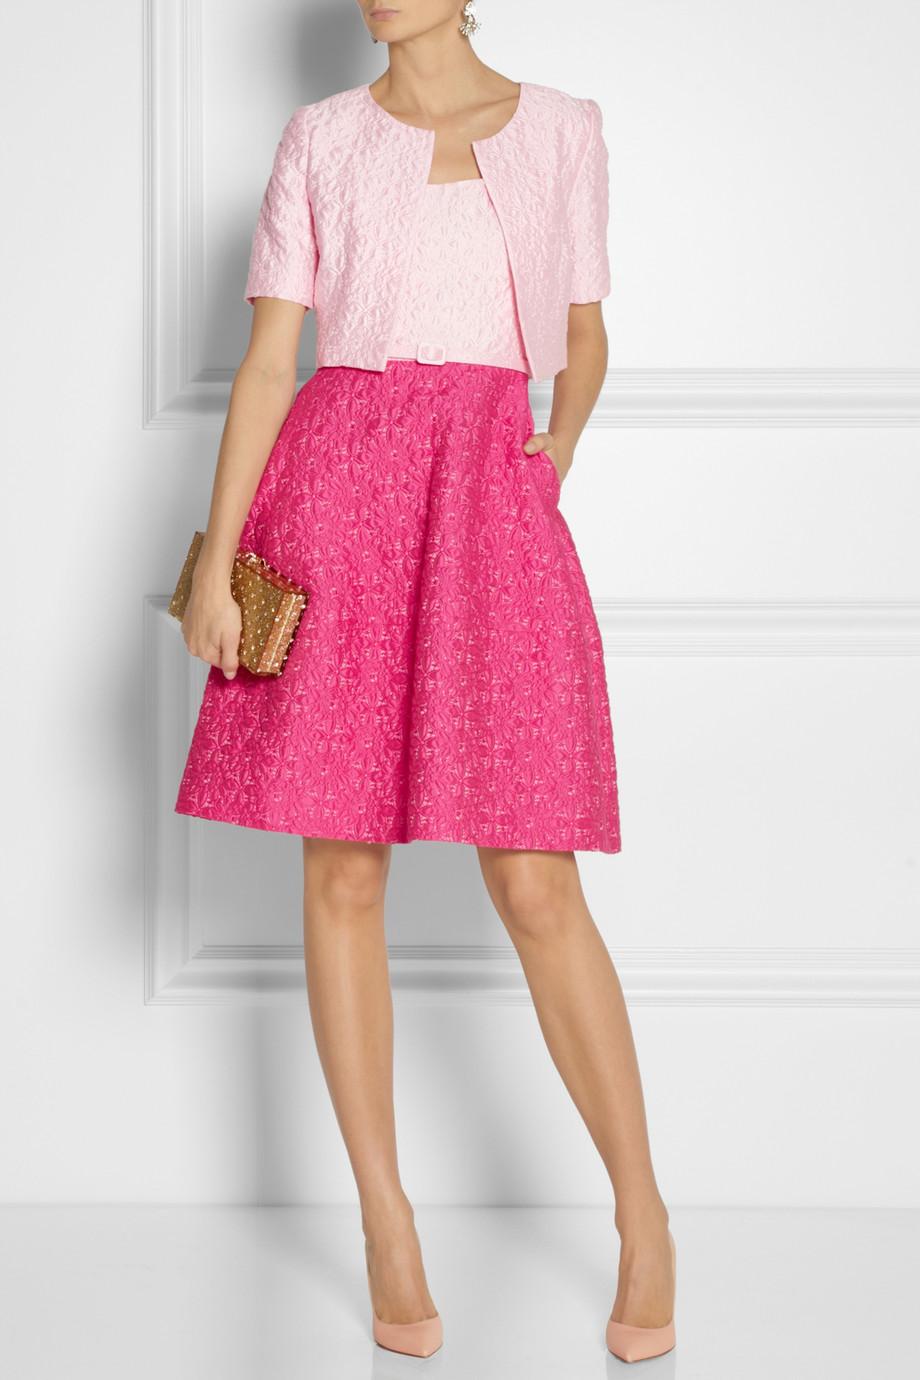 Oscar De La Renta Woman Cotton-blend Dress Magenta Size 2 Oscar De La Renta Outlet Pre Order Discount Purchase brUko